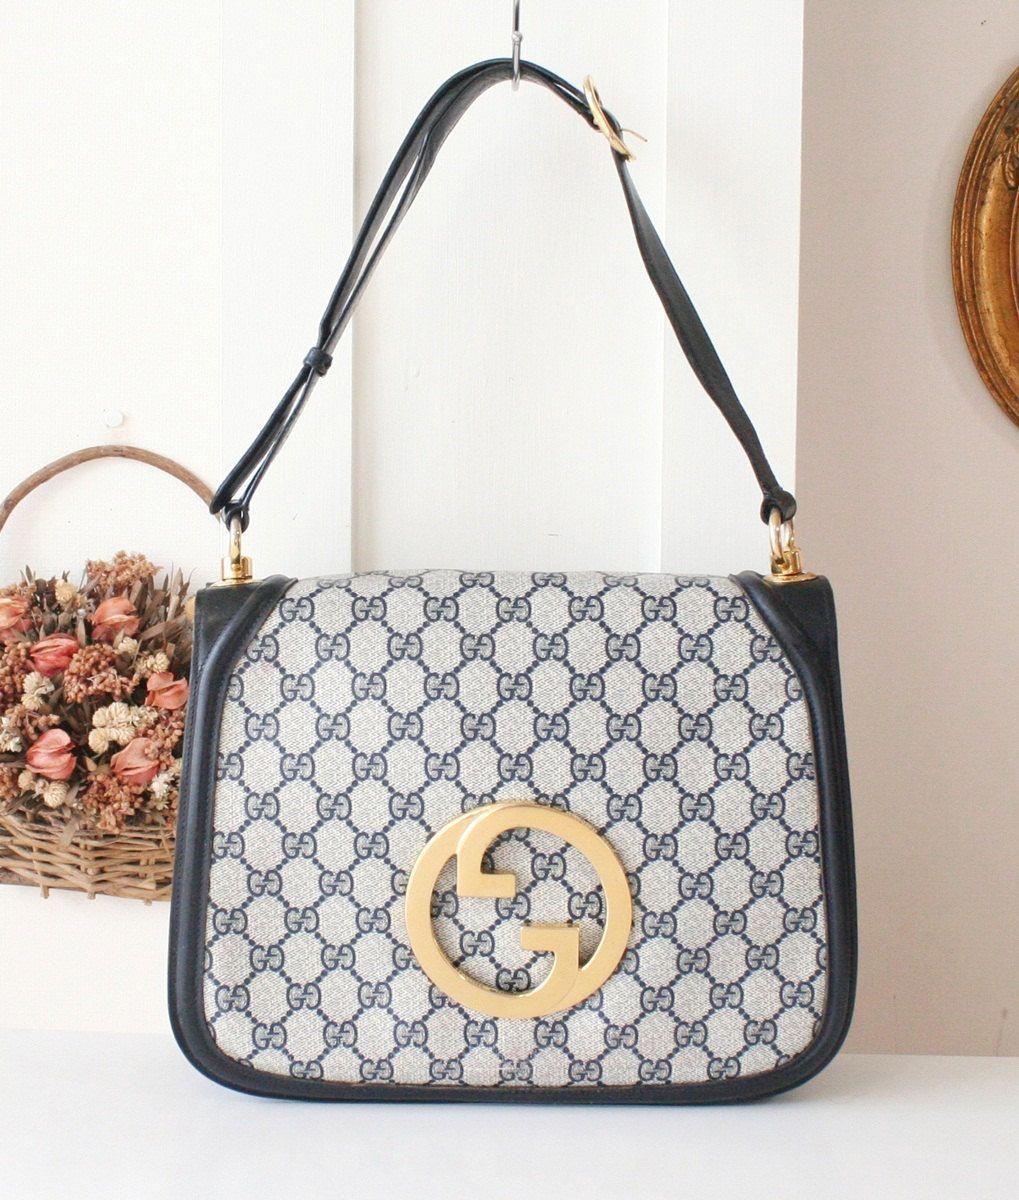 1169d945ee3 Vintage Gucci Bag - Monogram Big Logo 2 ways shoulder handbag purse  authentic by hfvin on Etsy  Vintage  Gucci  Bag  monogrammed  biglogo   2ways ...